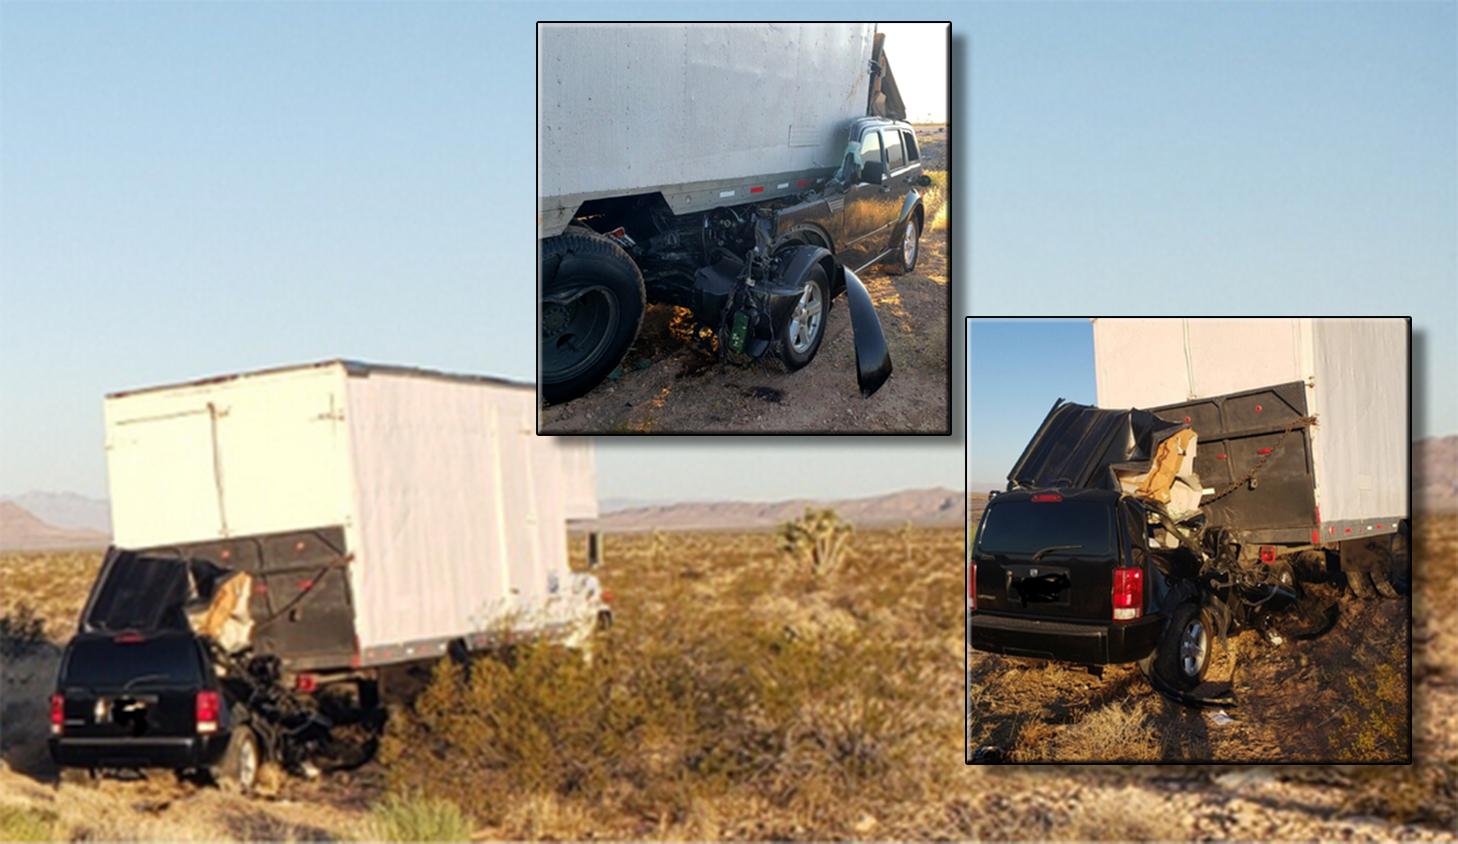 Fatal crash on I-15 near Mesquite   KLAS - 8 News Now